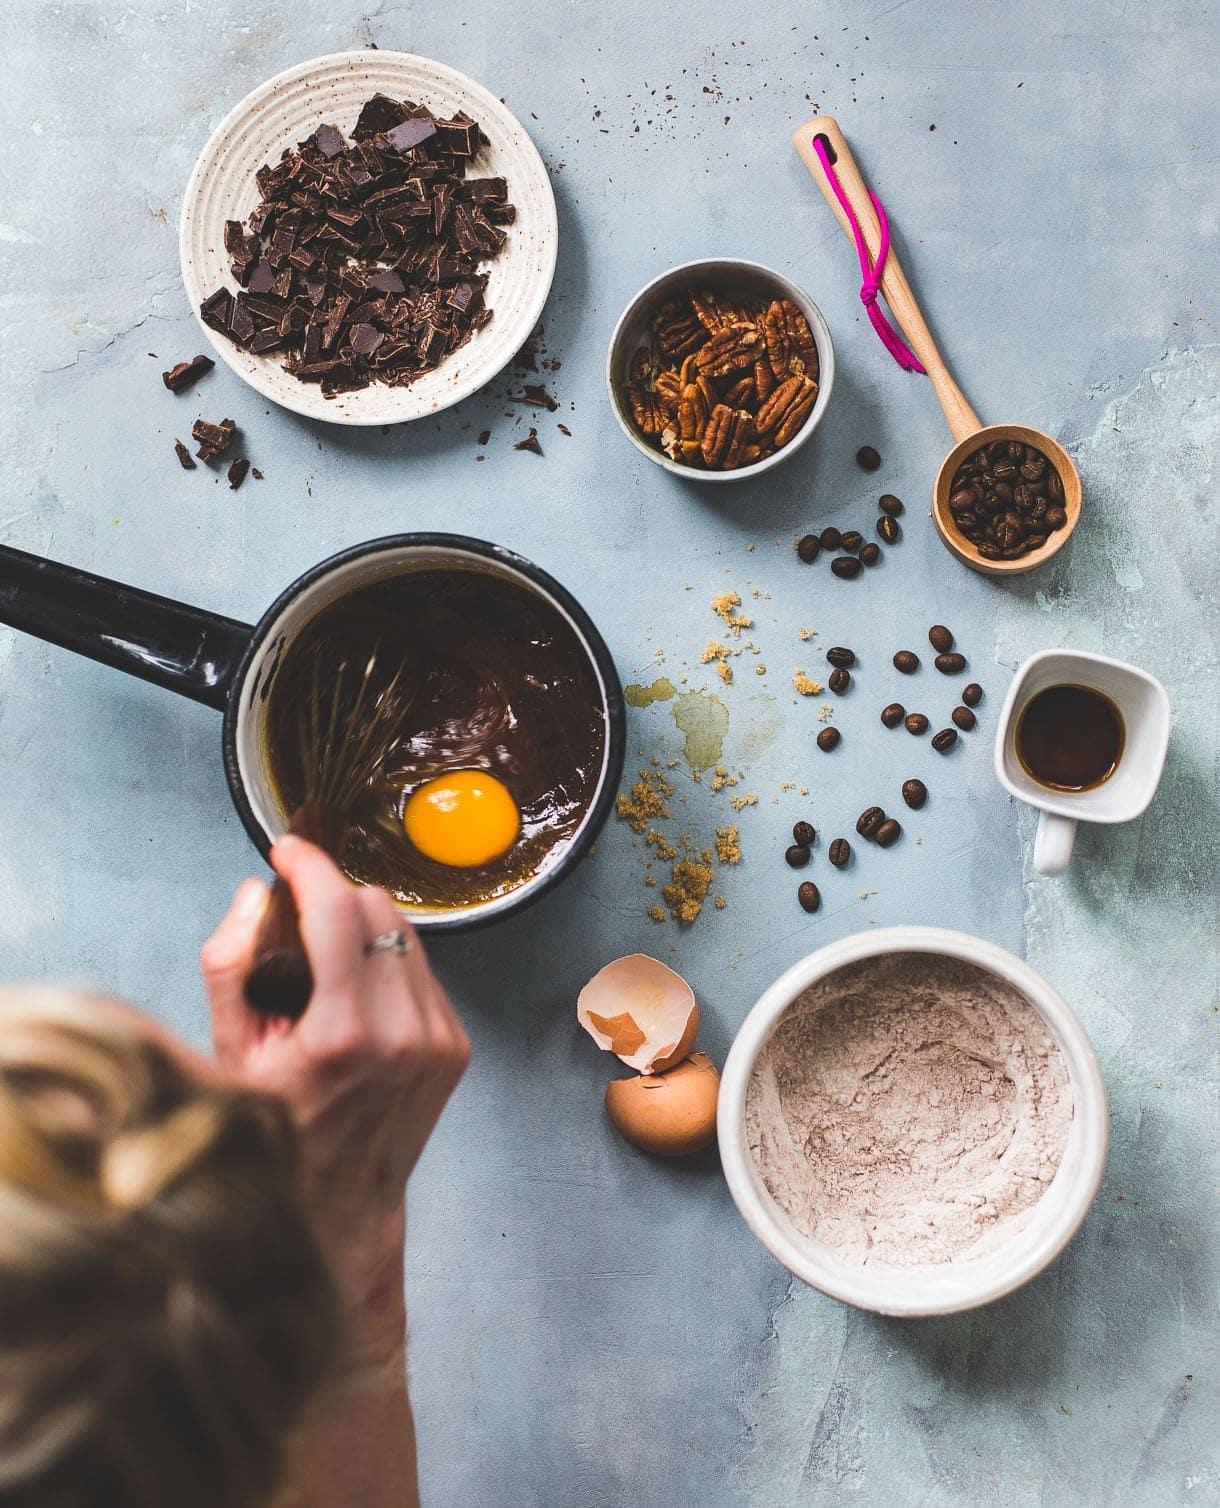 Heartbeet Kitchen - baking photograph - cooking process phot0